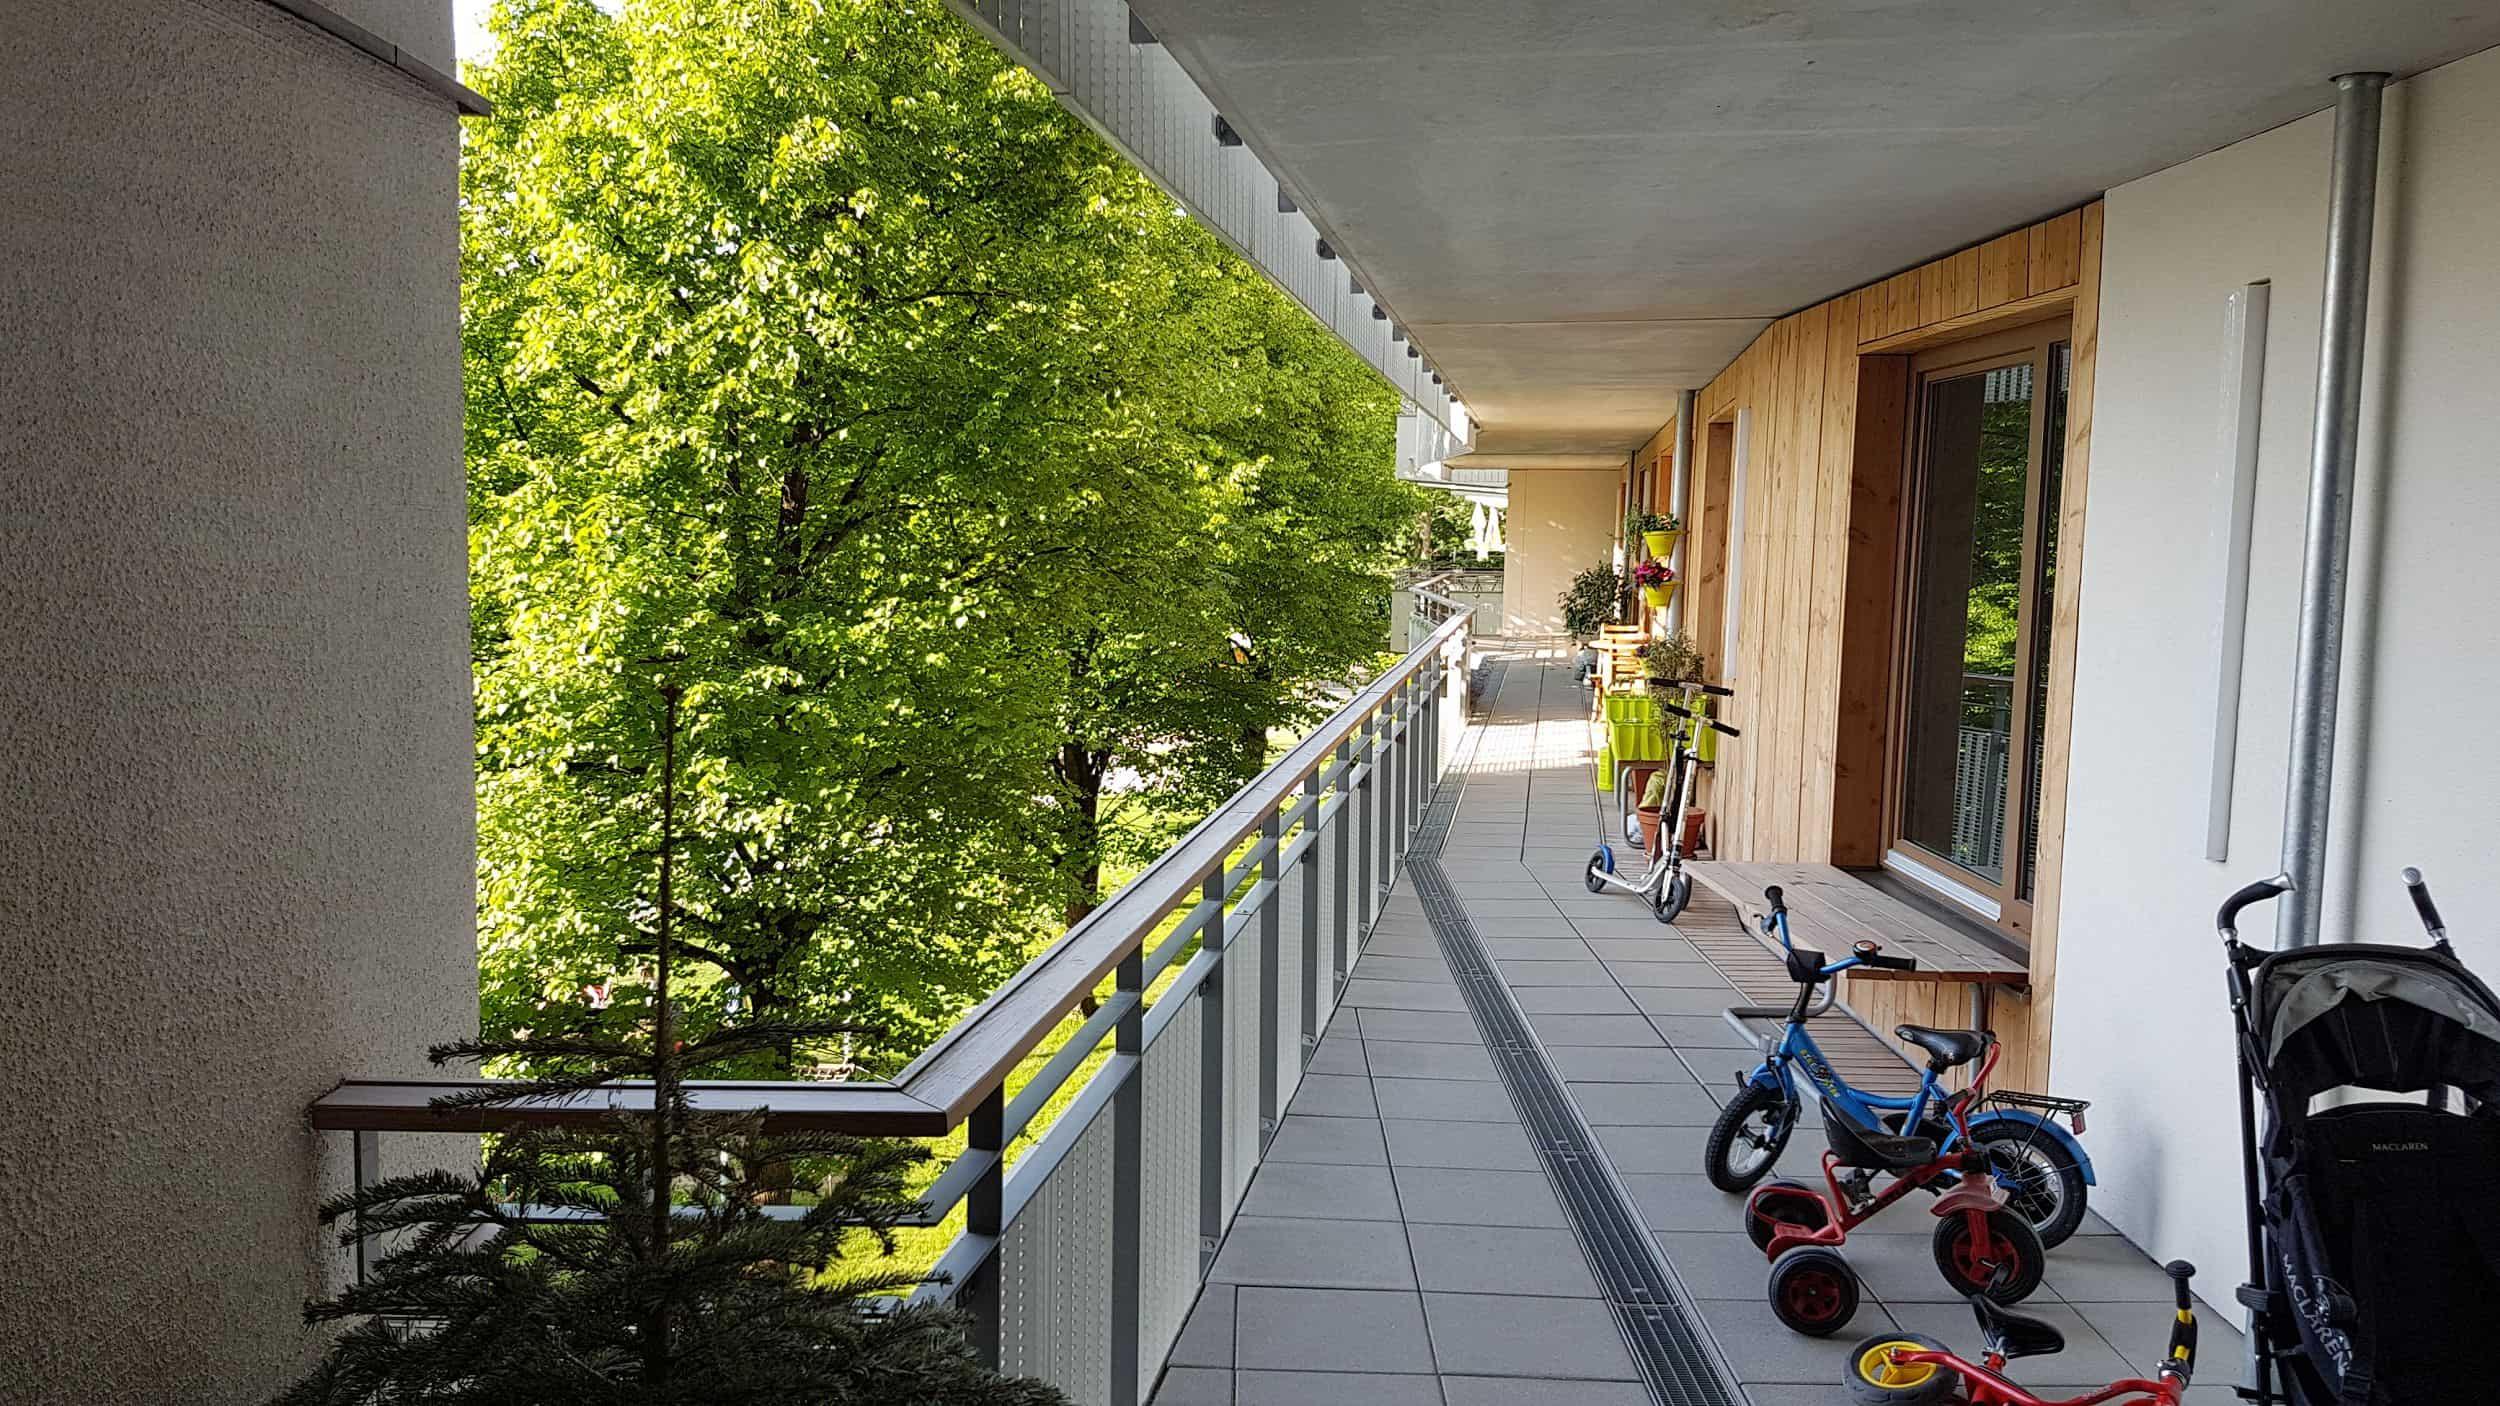 Bild: Laubengang am grünen Innenhof, Foto: ver.de landschaftsarchitektur